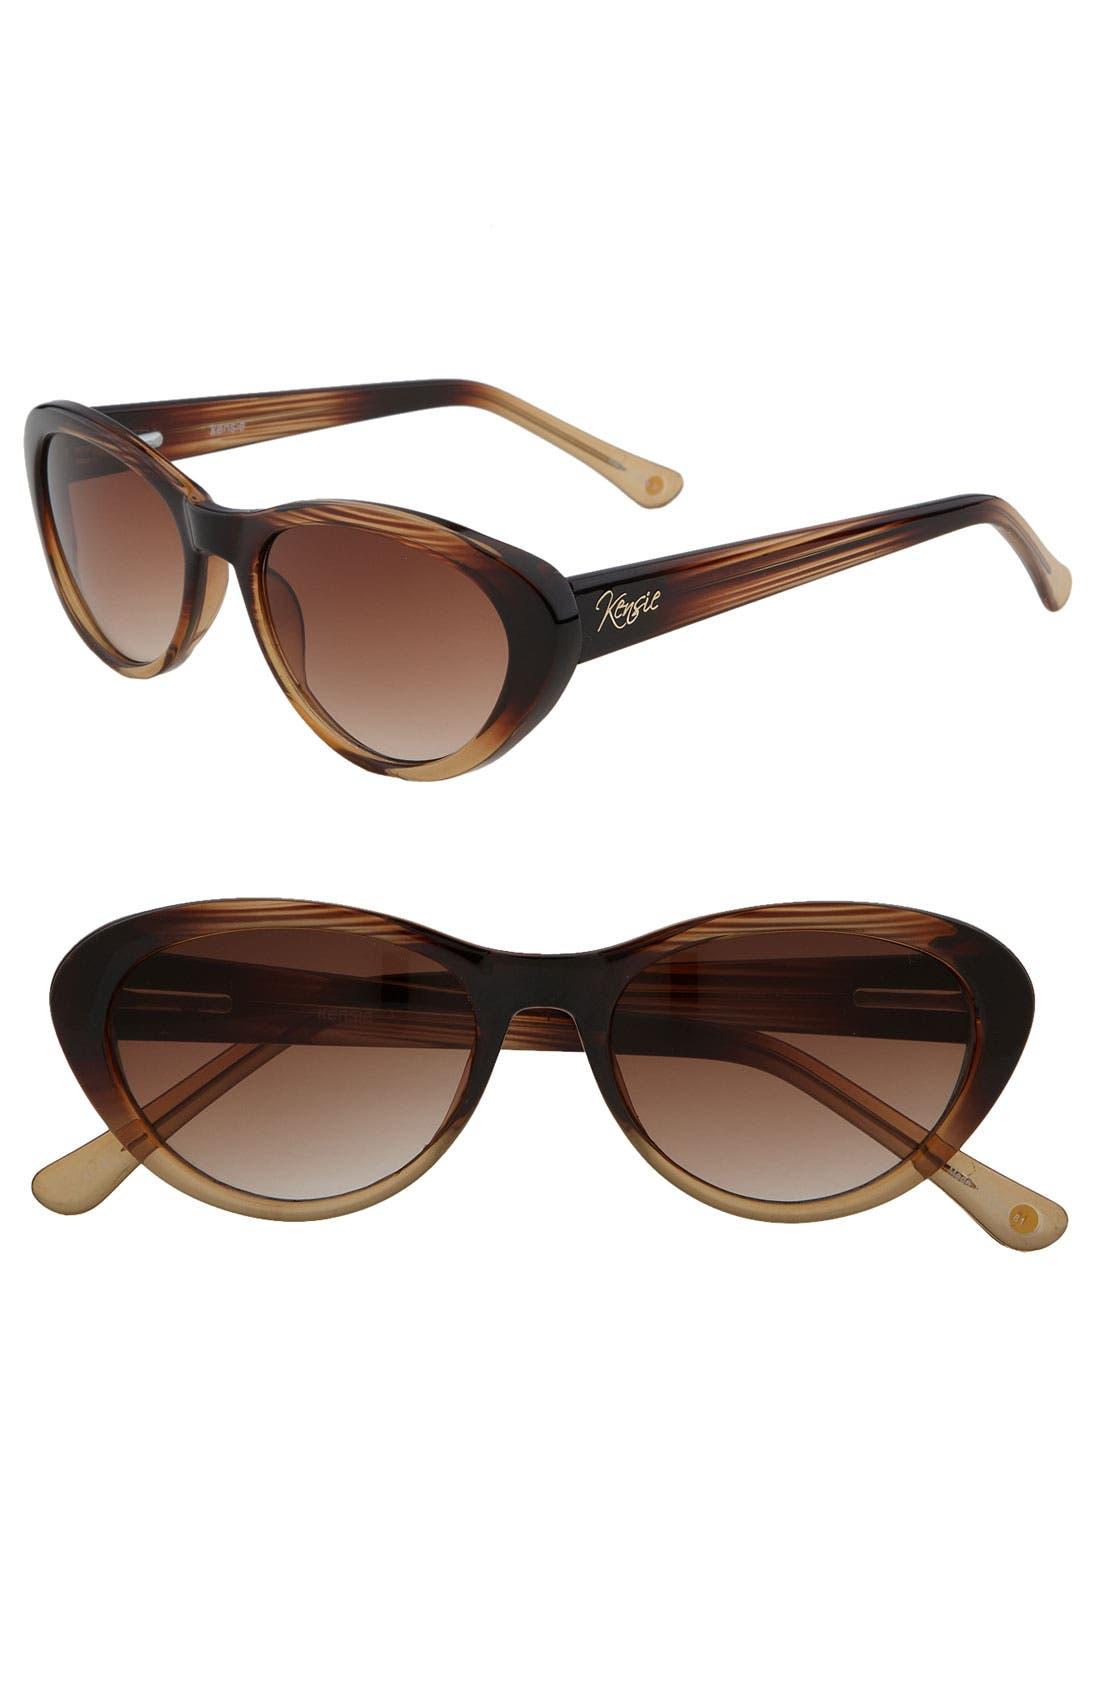 'Portia' Cat's Eye Sunglasses,                             Main thumbnail 1, color,                             200